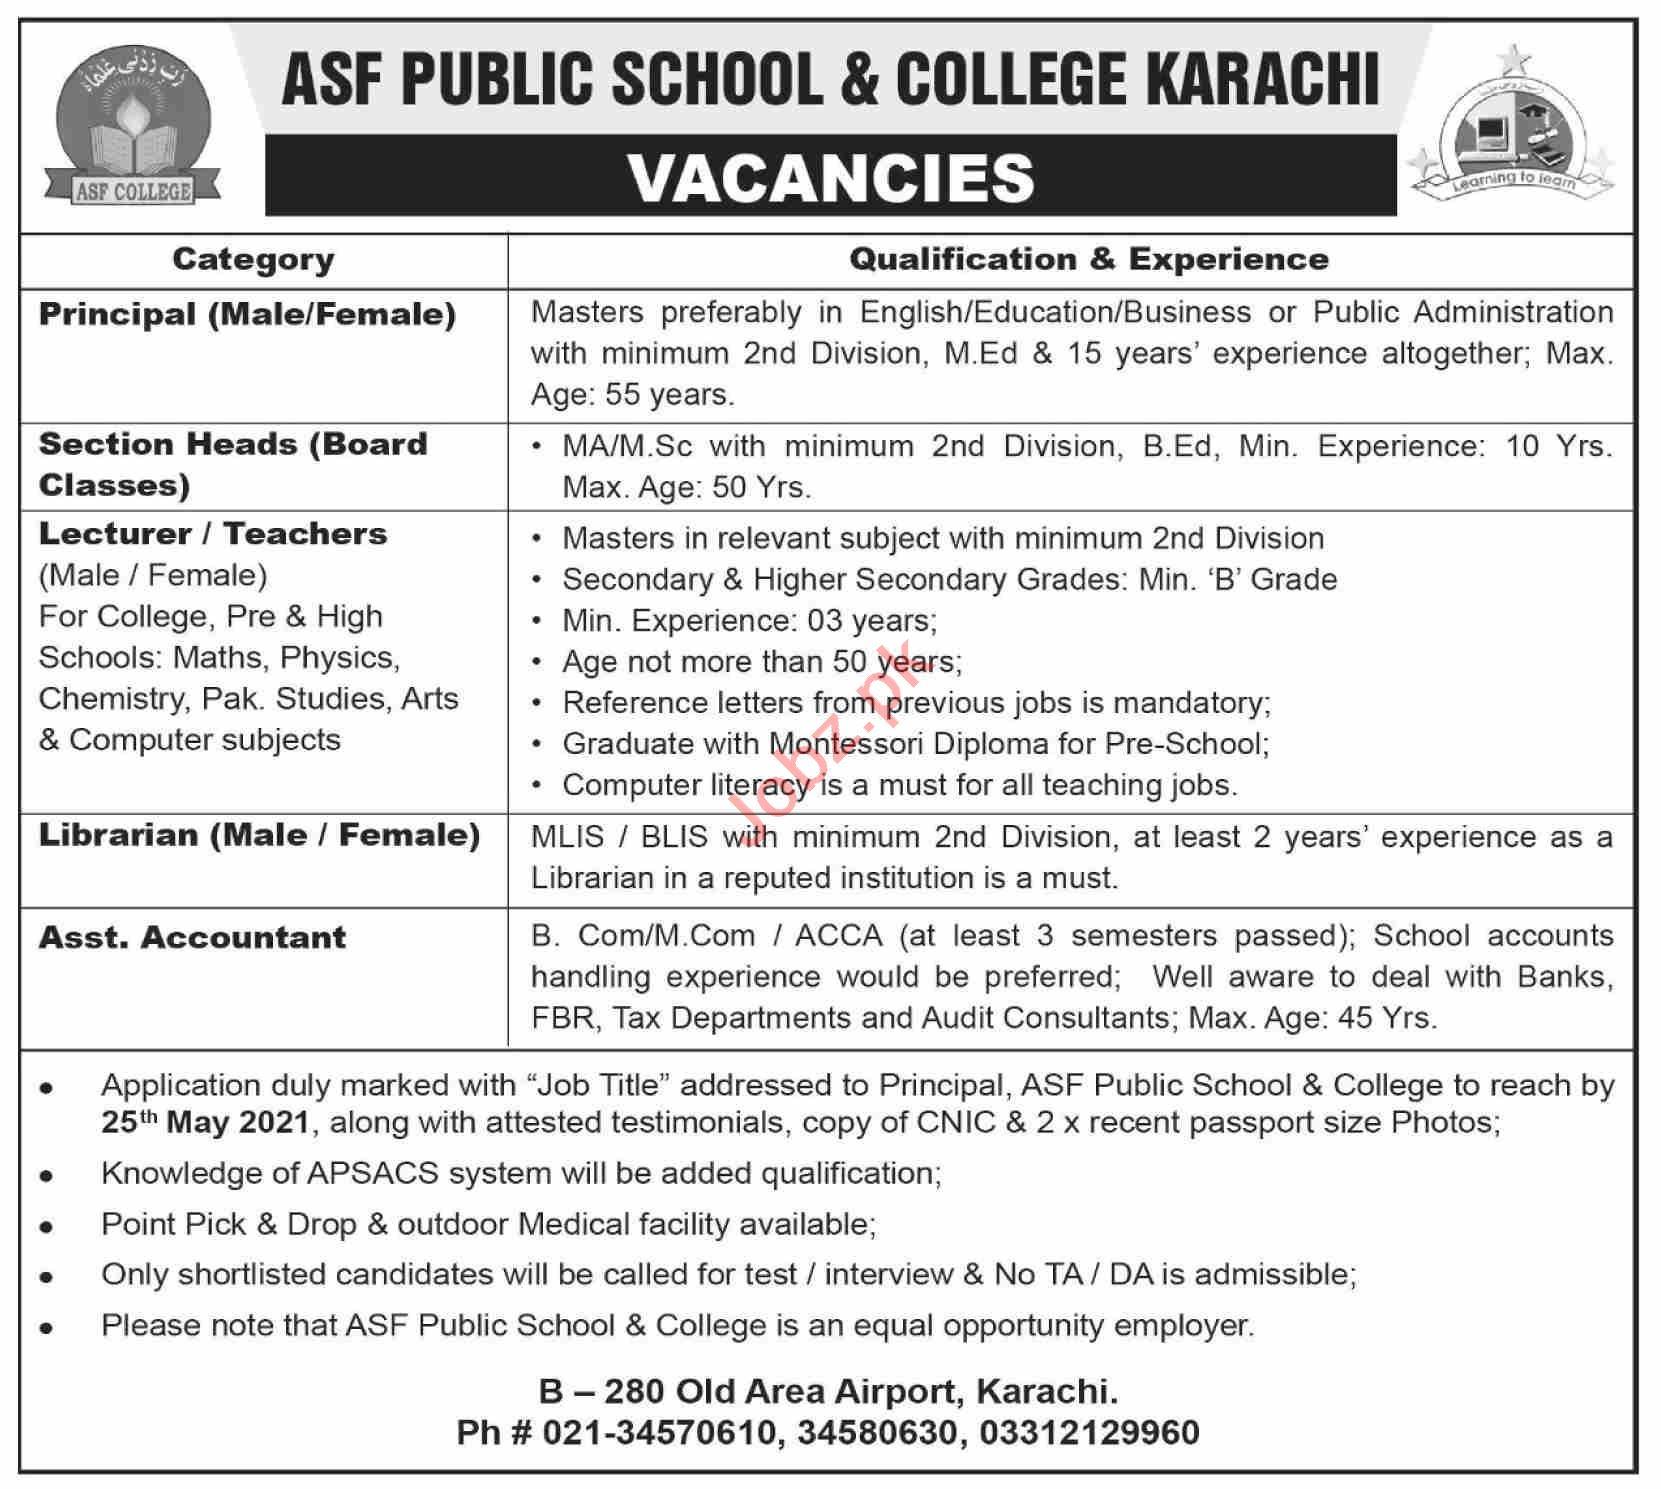 ASF Public School & College Karachi Jobs 2021 for Principal